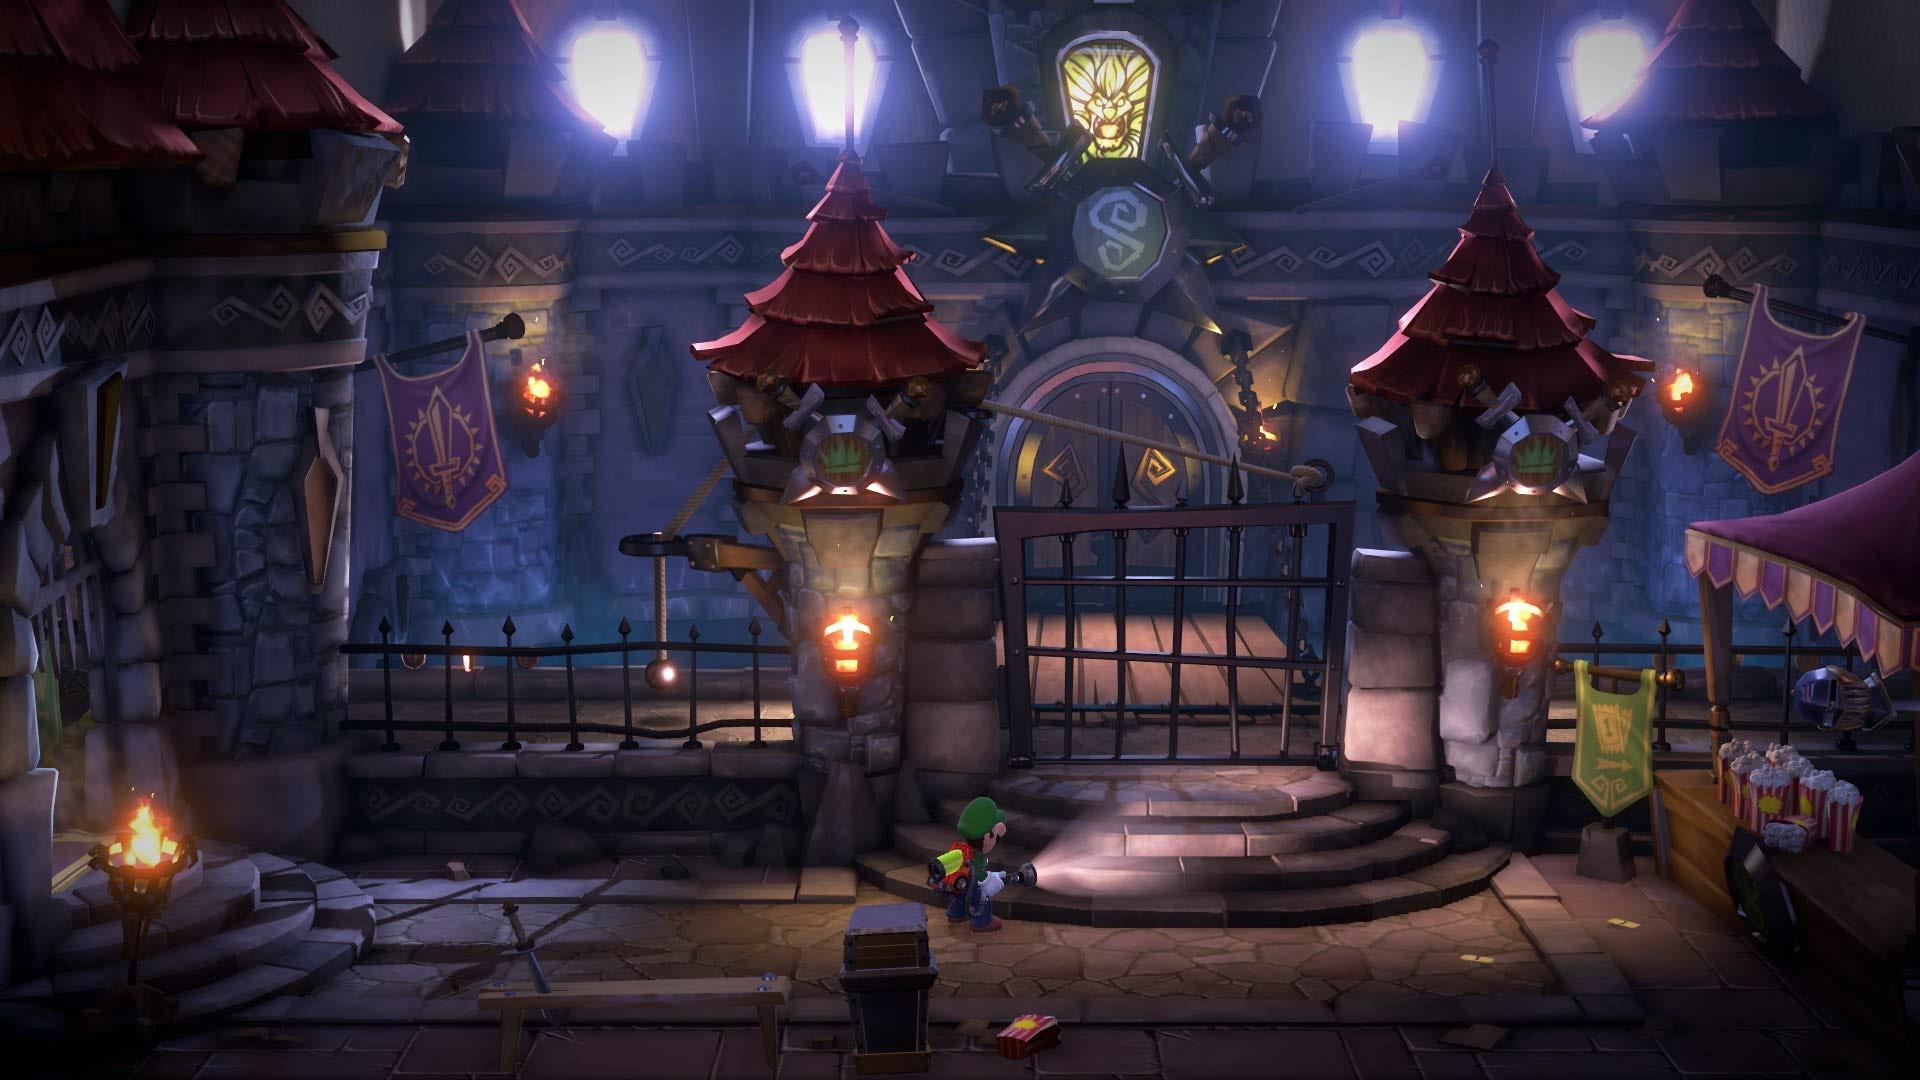 Luigi exploring a castle-themed level.